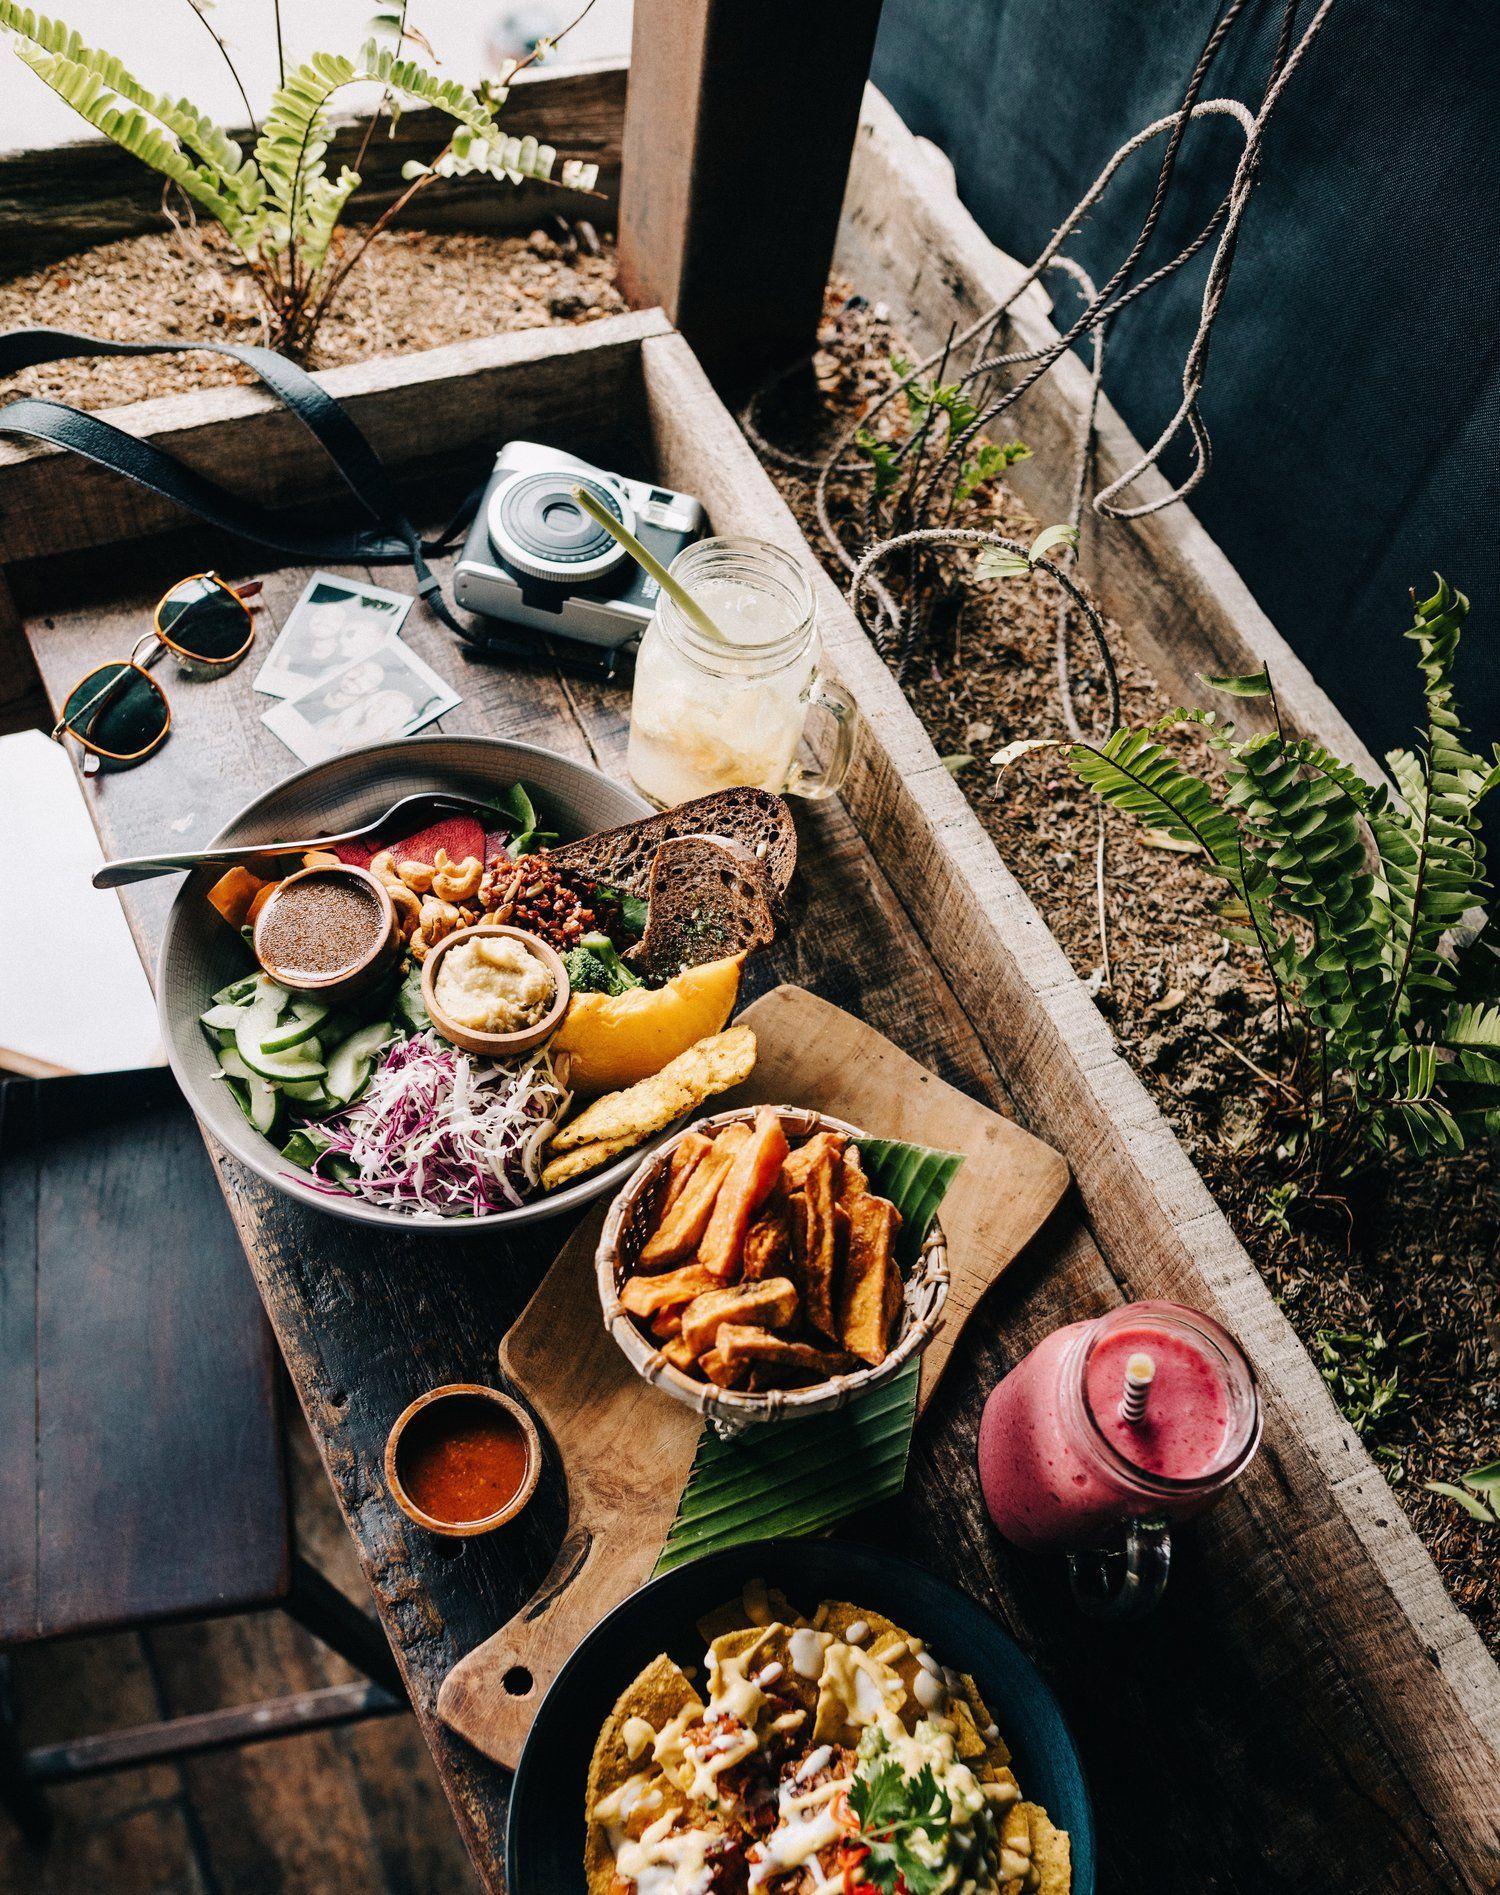 Mothermantismarket Food Vegetarian Vegan Recipes Vegan Eating